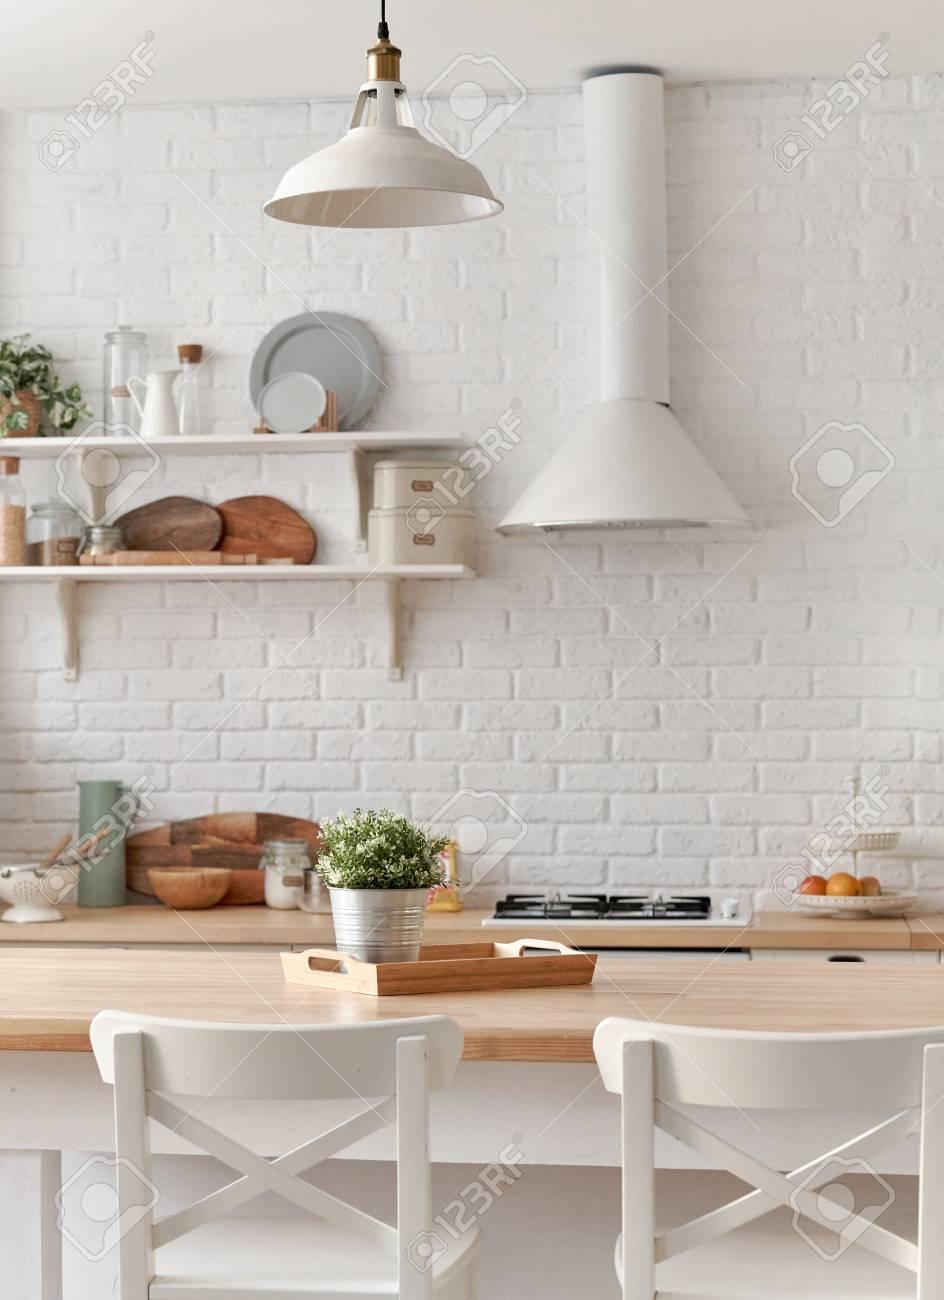 Kitchen table with kitchen chairs. Kitchen background.